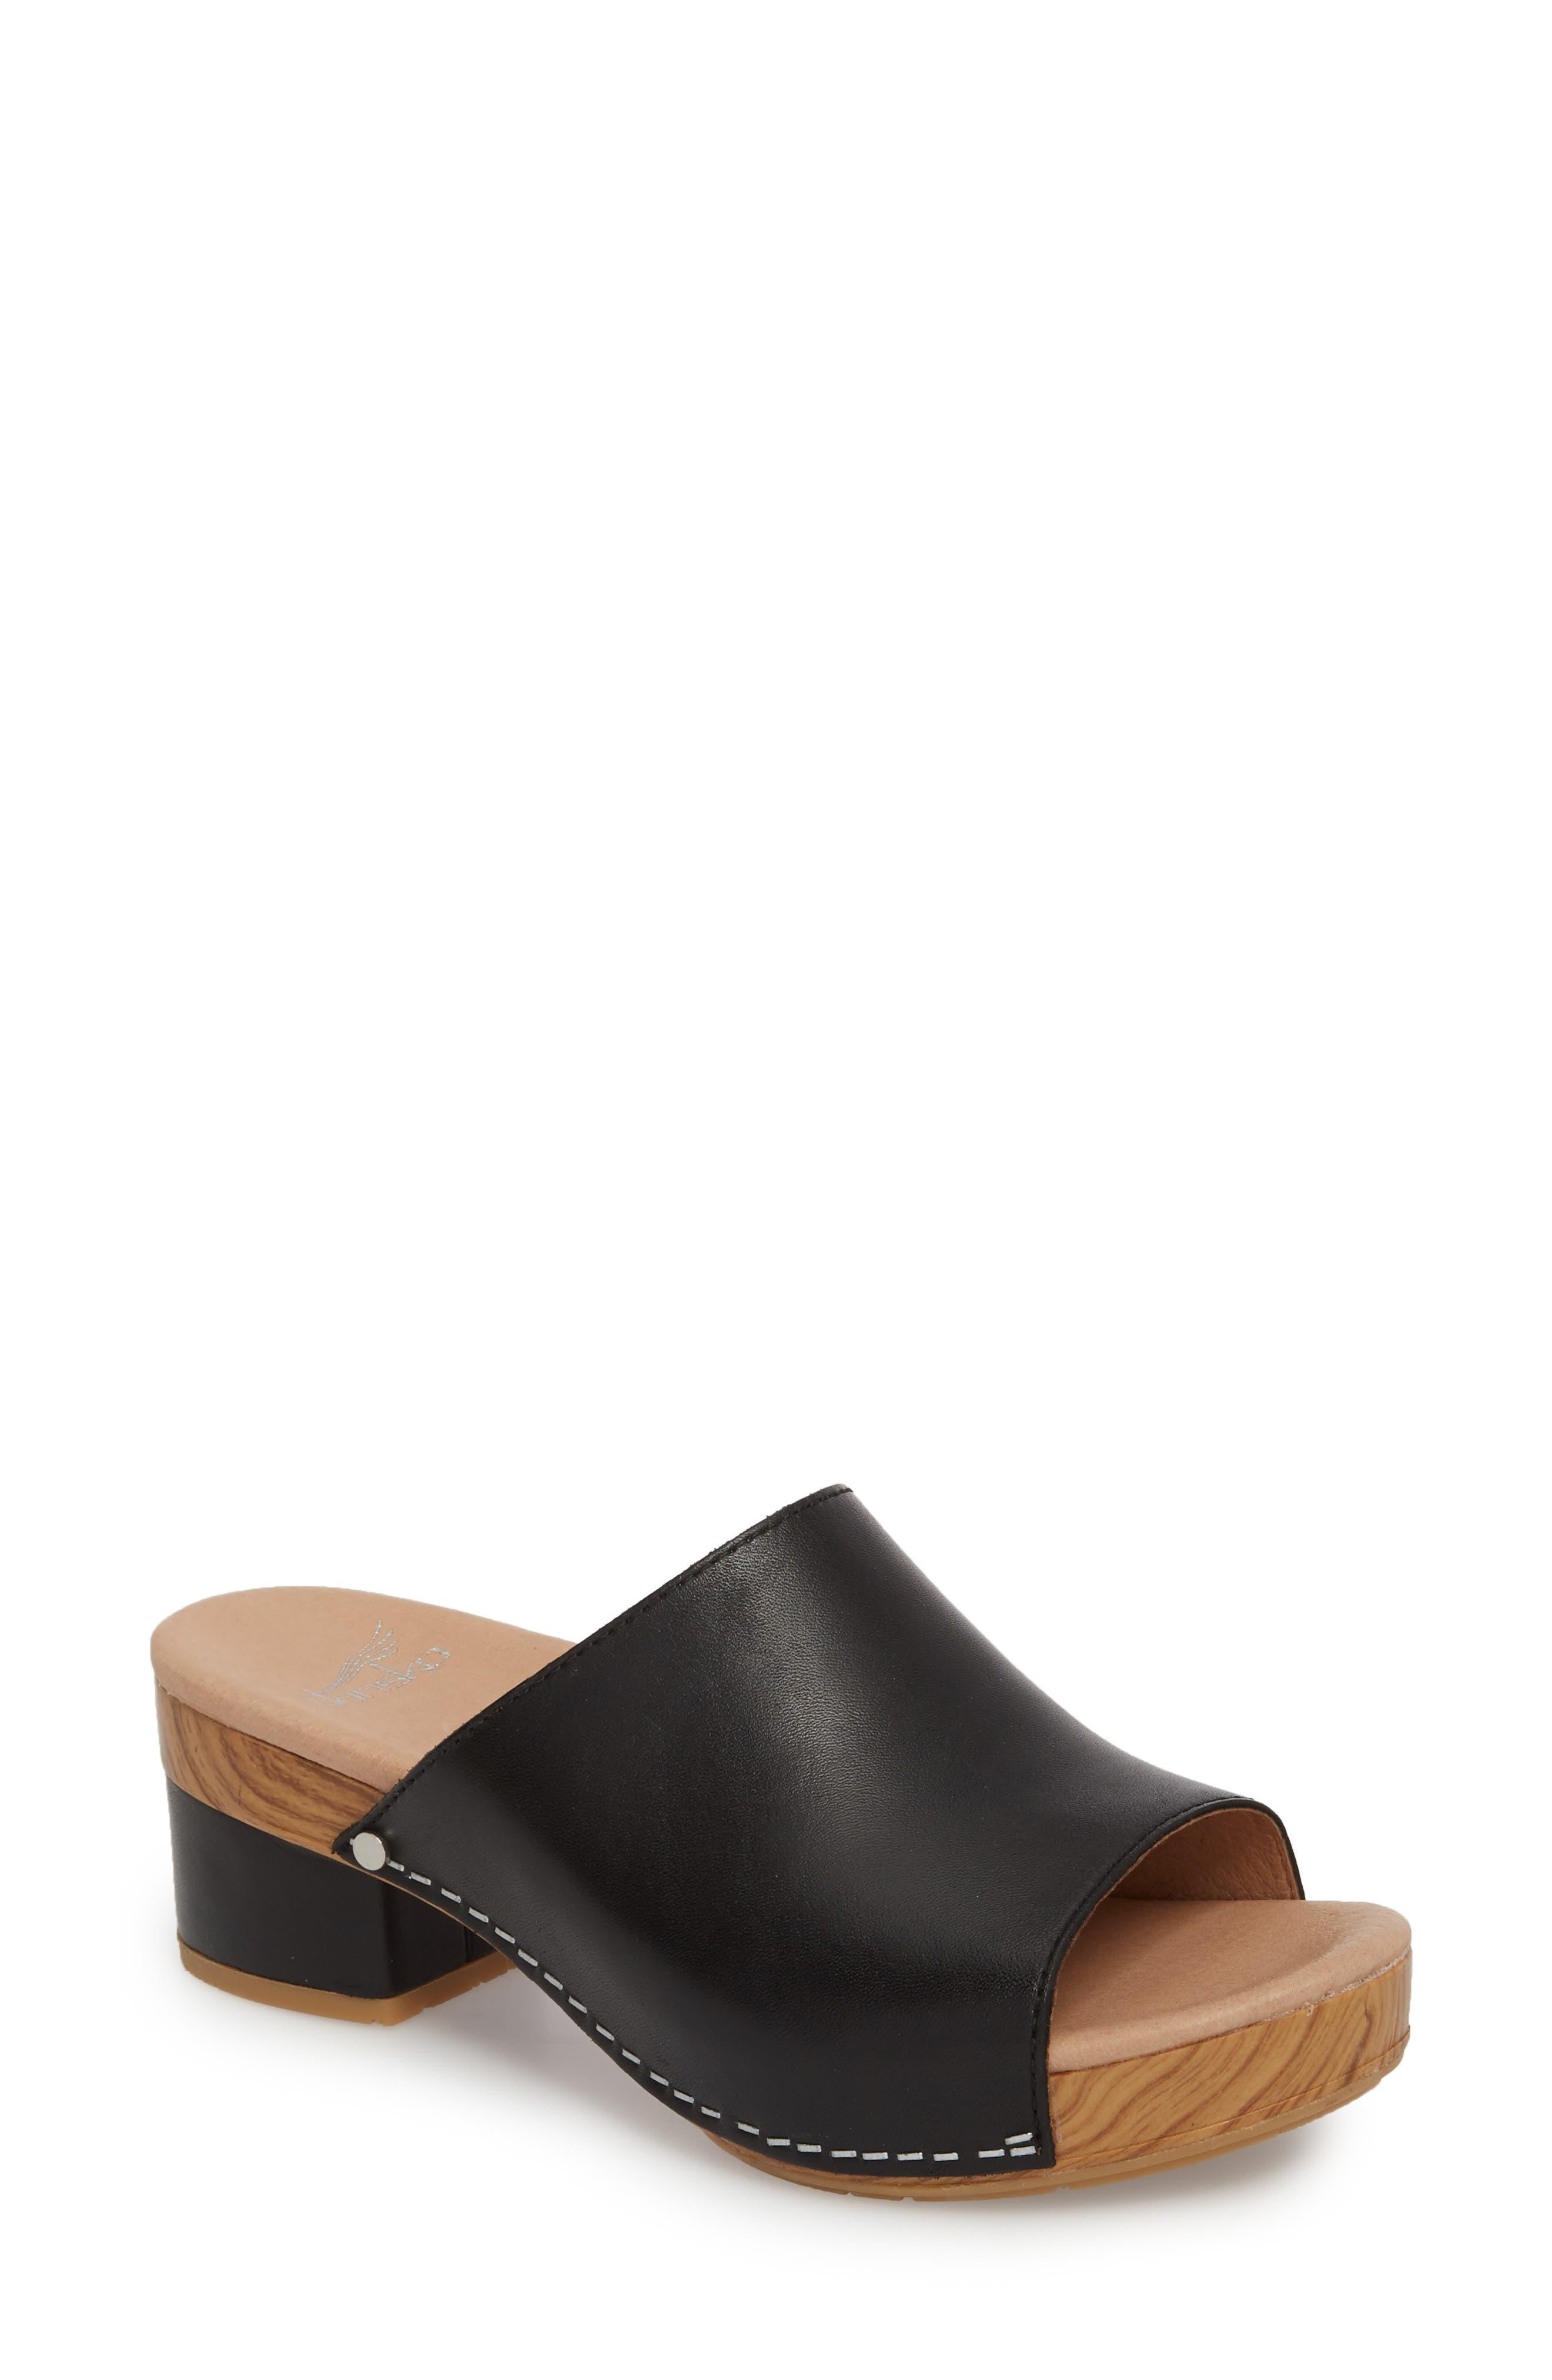 f5f6dcdda68 Women s Dansko Comfortable Sandals